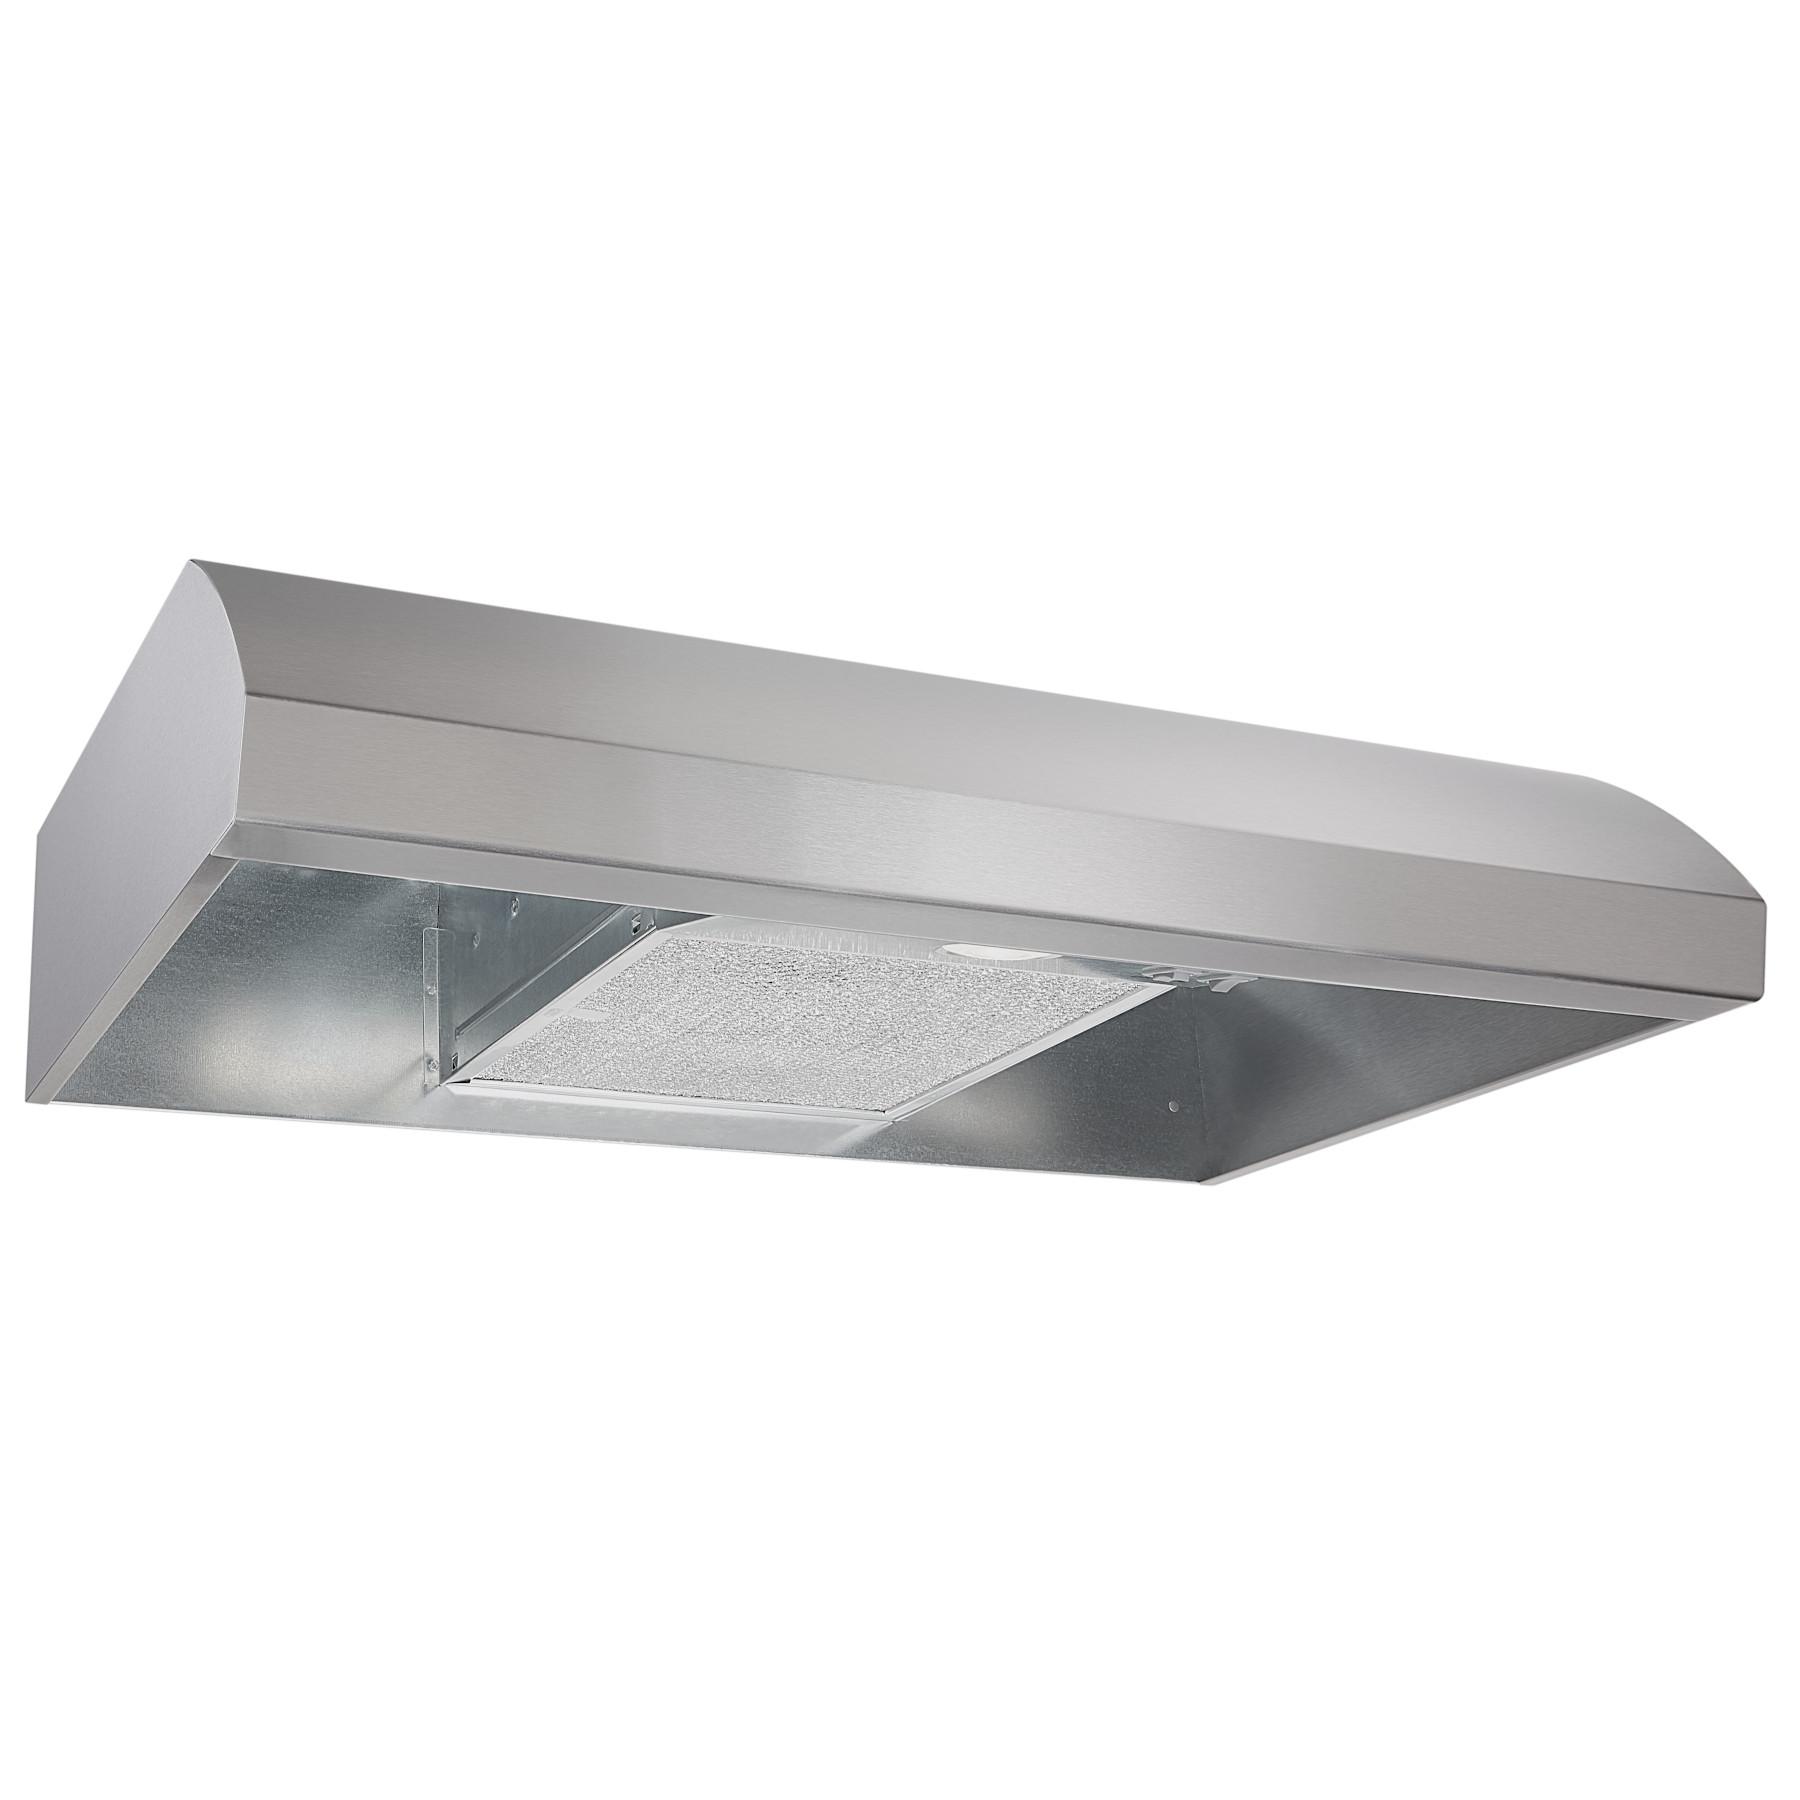 Broan® 30-Inch 4-Way Convertible Under-Cabinet Range Hood, 270 Max CFM, Stainless Steel